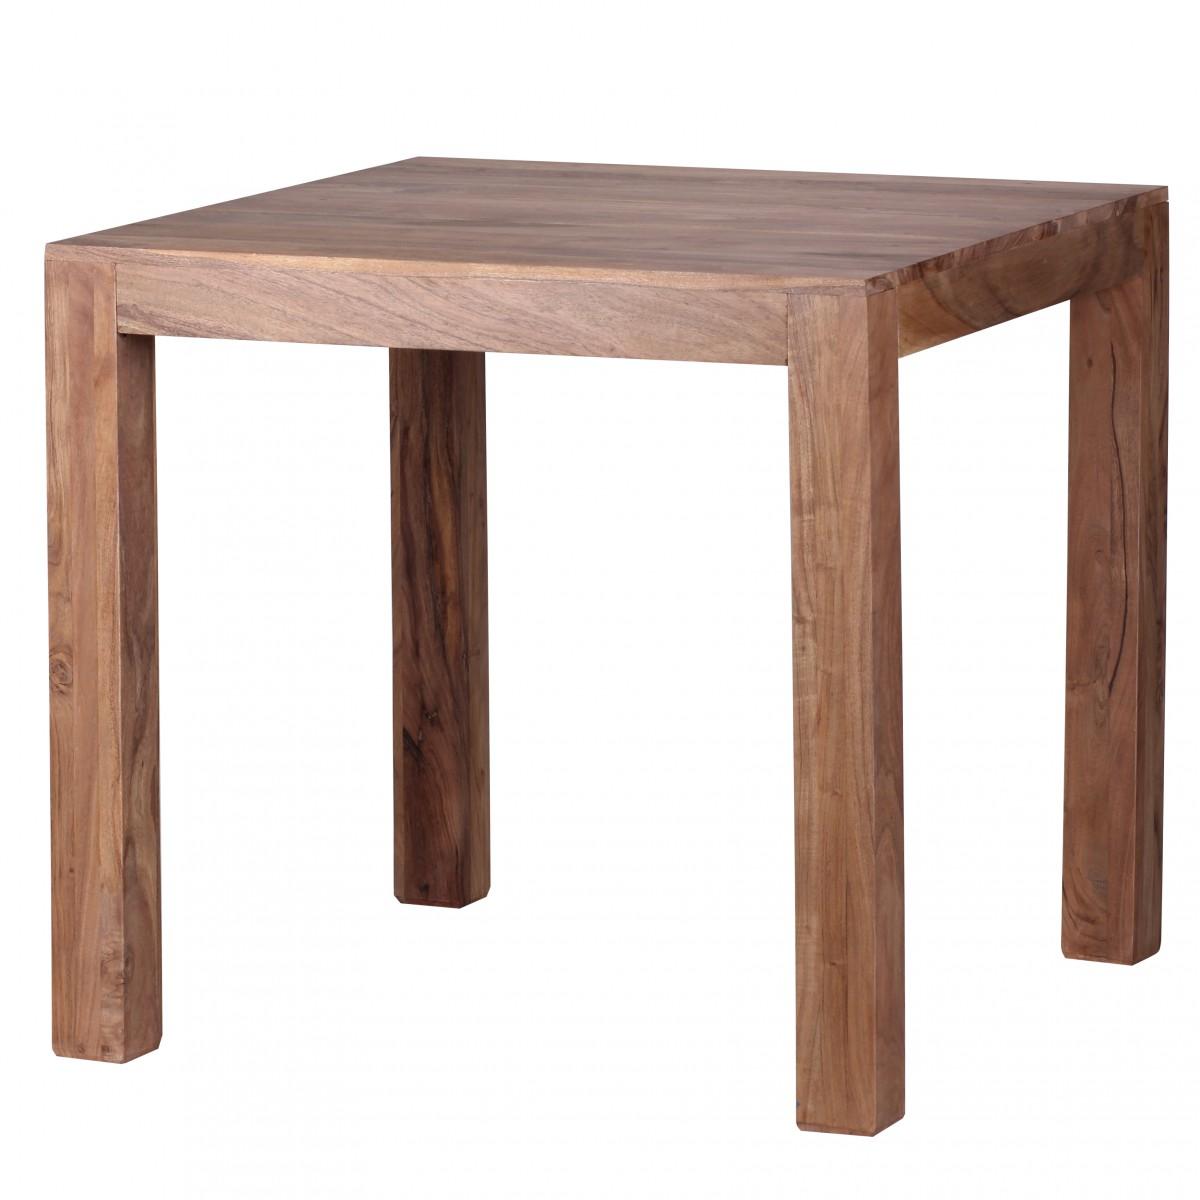 Wohnling conception table manger carr 80 x 80 cm acacia massif de feuillus - Table en acacia massif ...